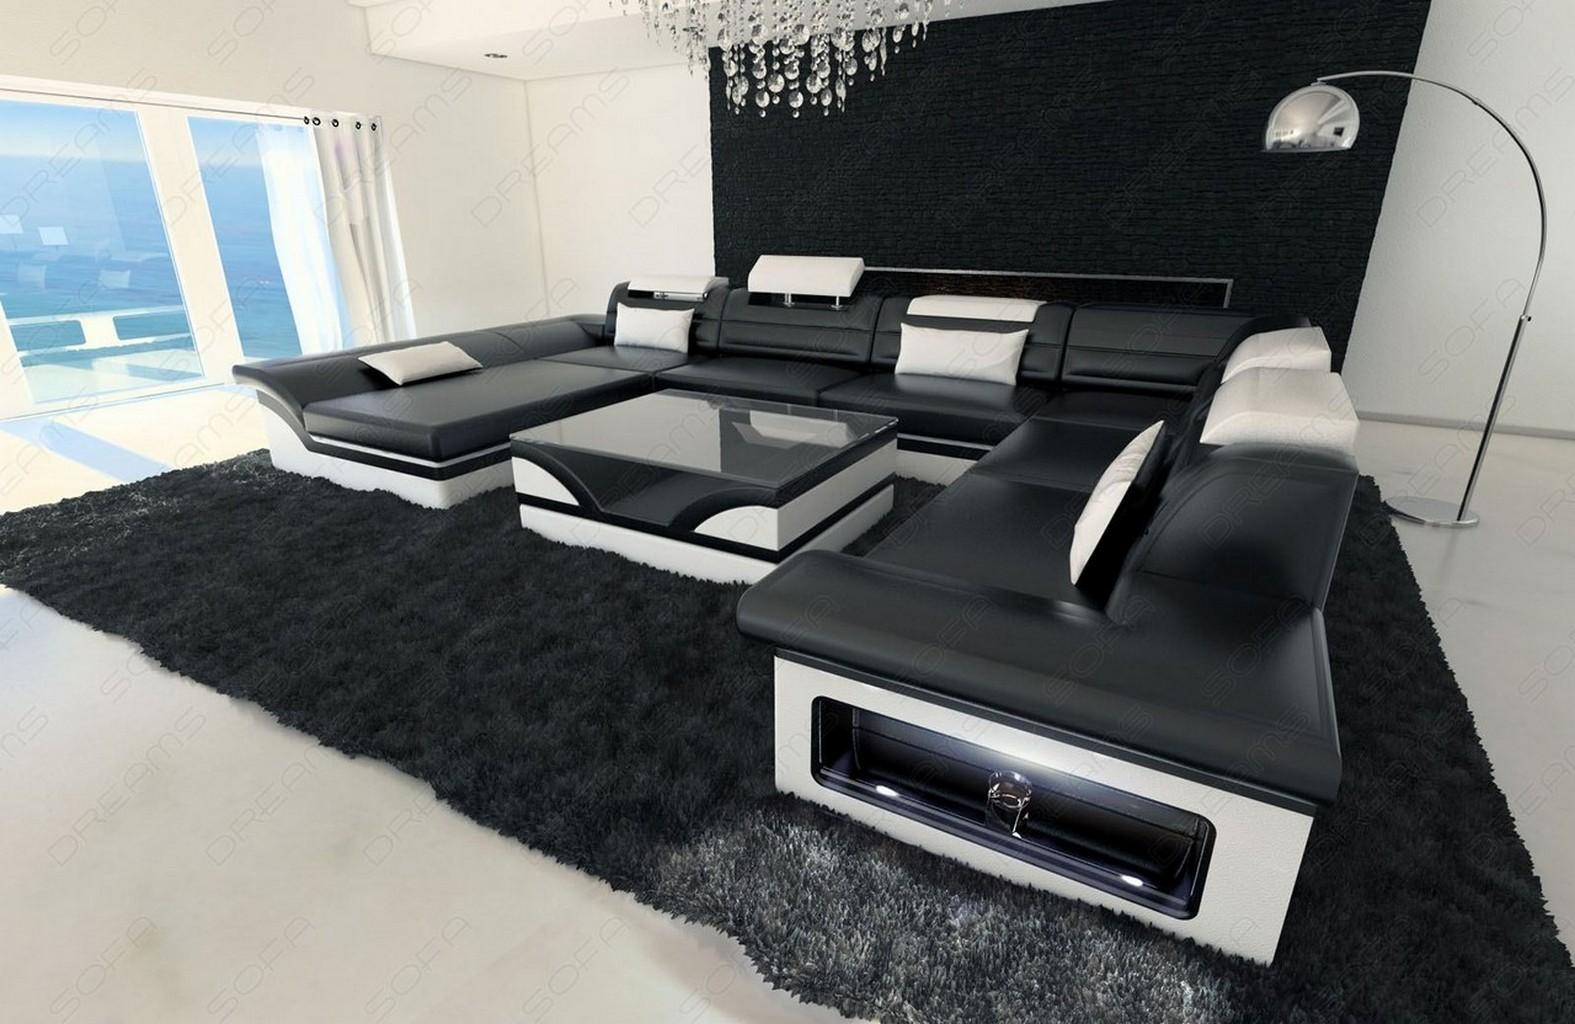 leather sectional sofa enzo xxl black white. Black Bedroom Furniture Sets. Home Design Ideas